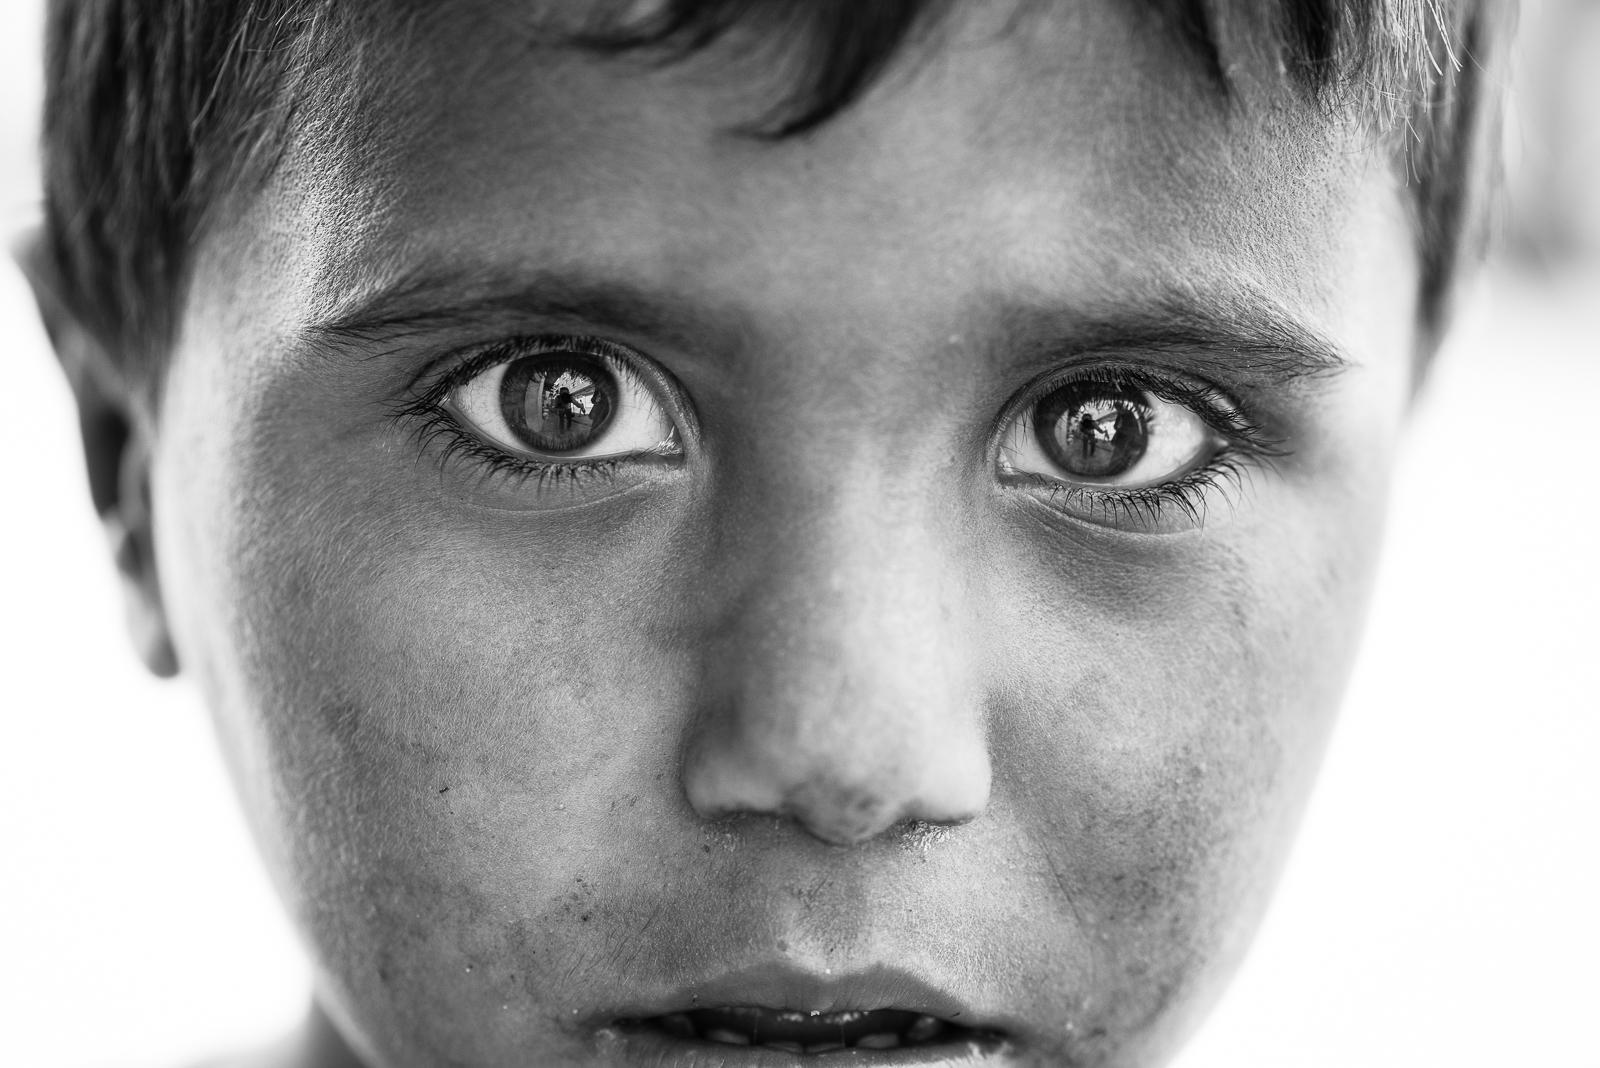 The power of child's gaze, Zakho